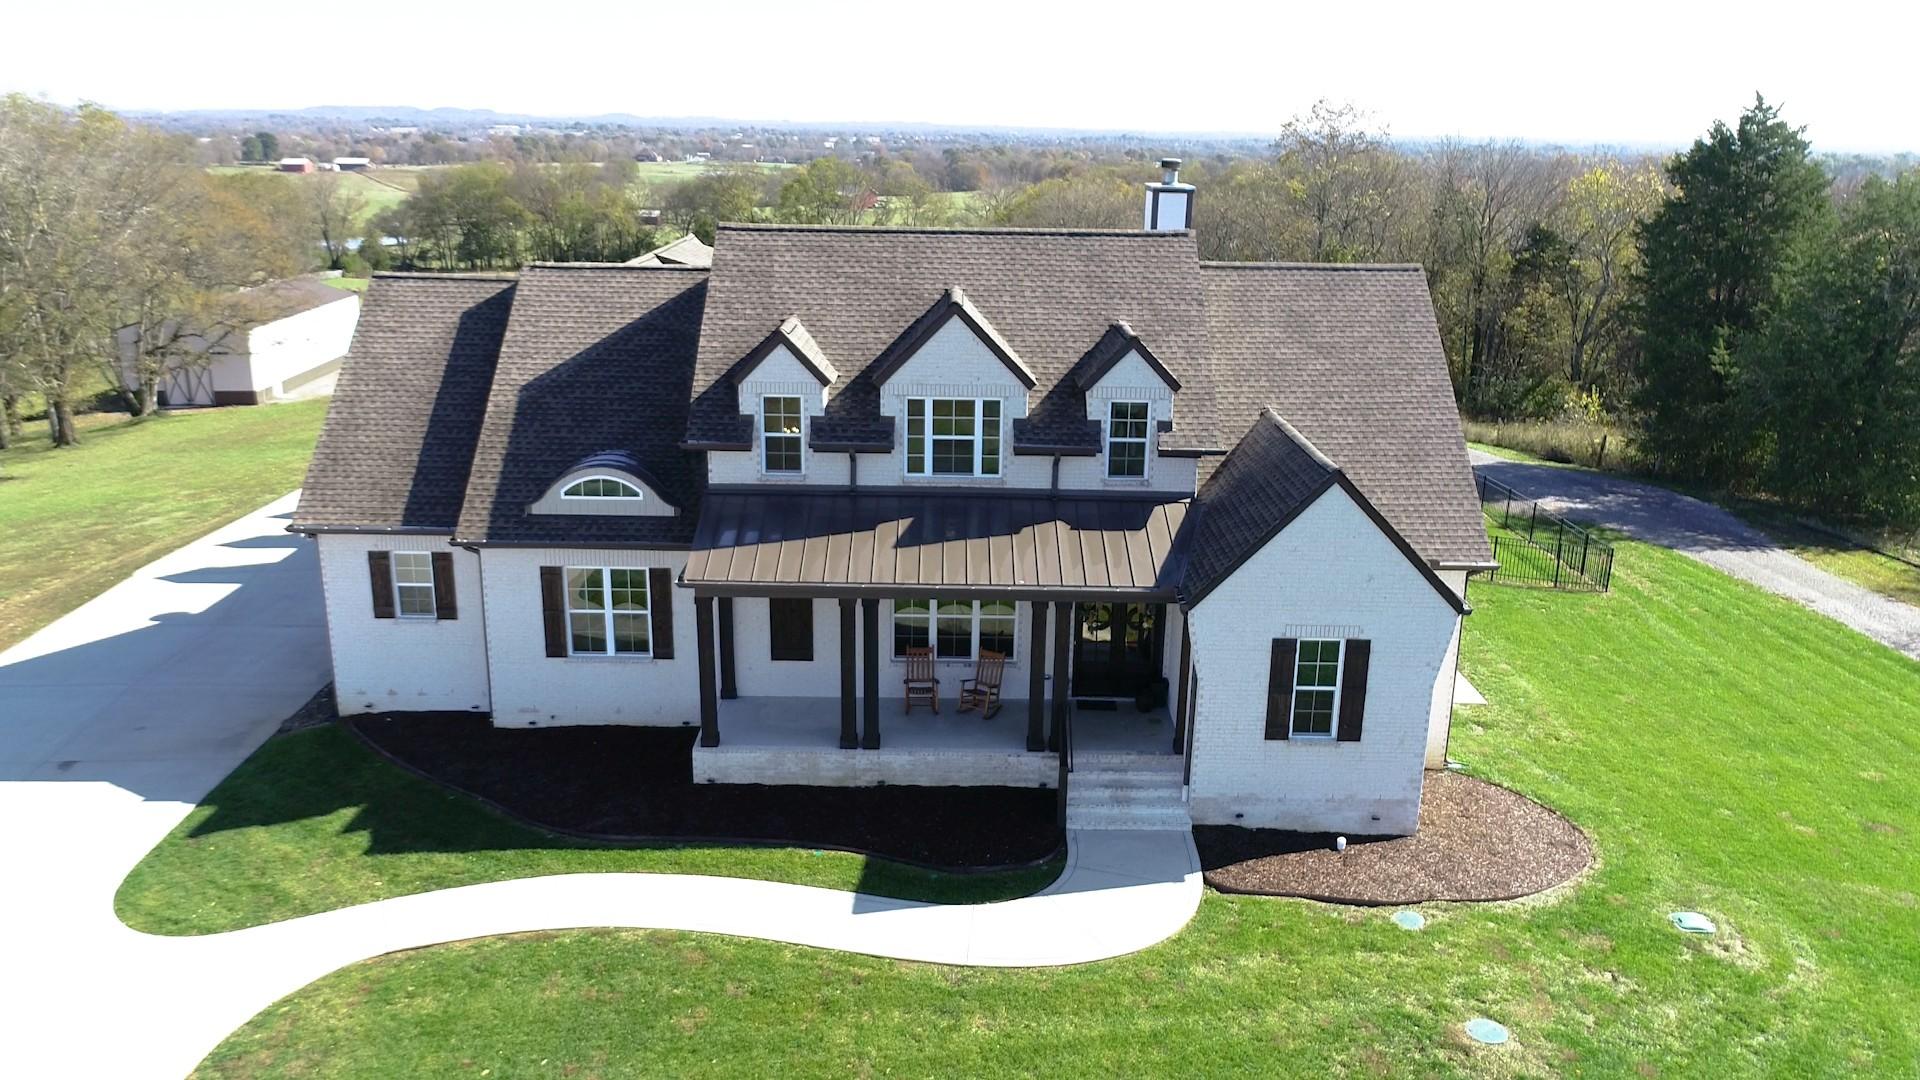 1655 Liberty Ln, Gallatin, TN 37066 - Gallatin, TN real estate listing